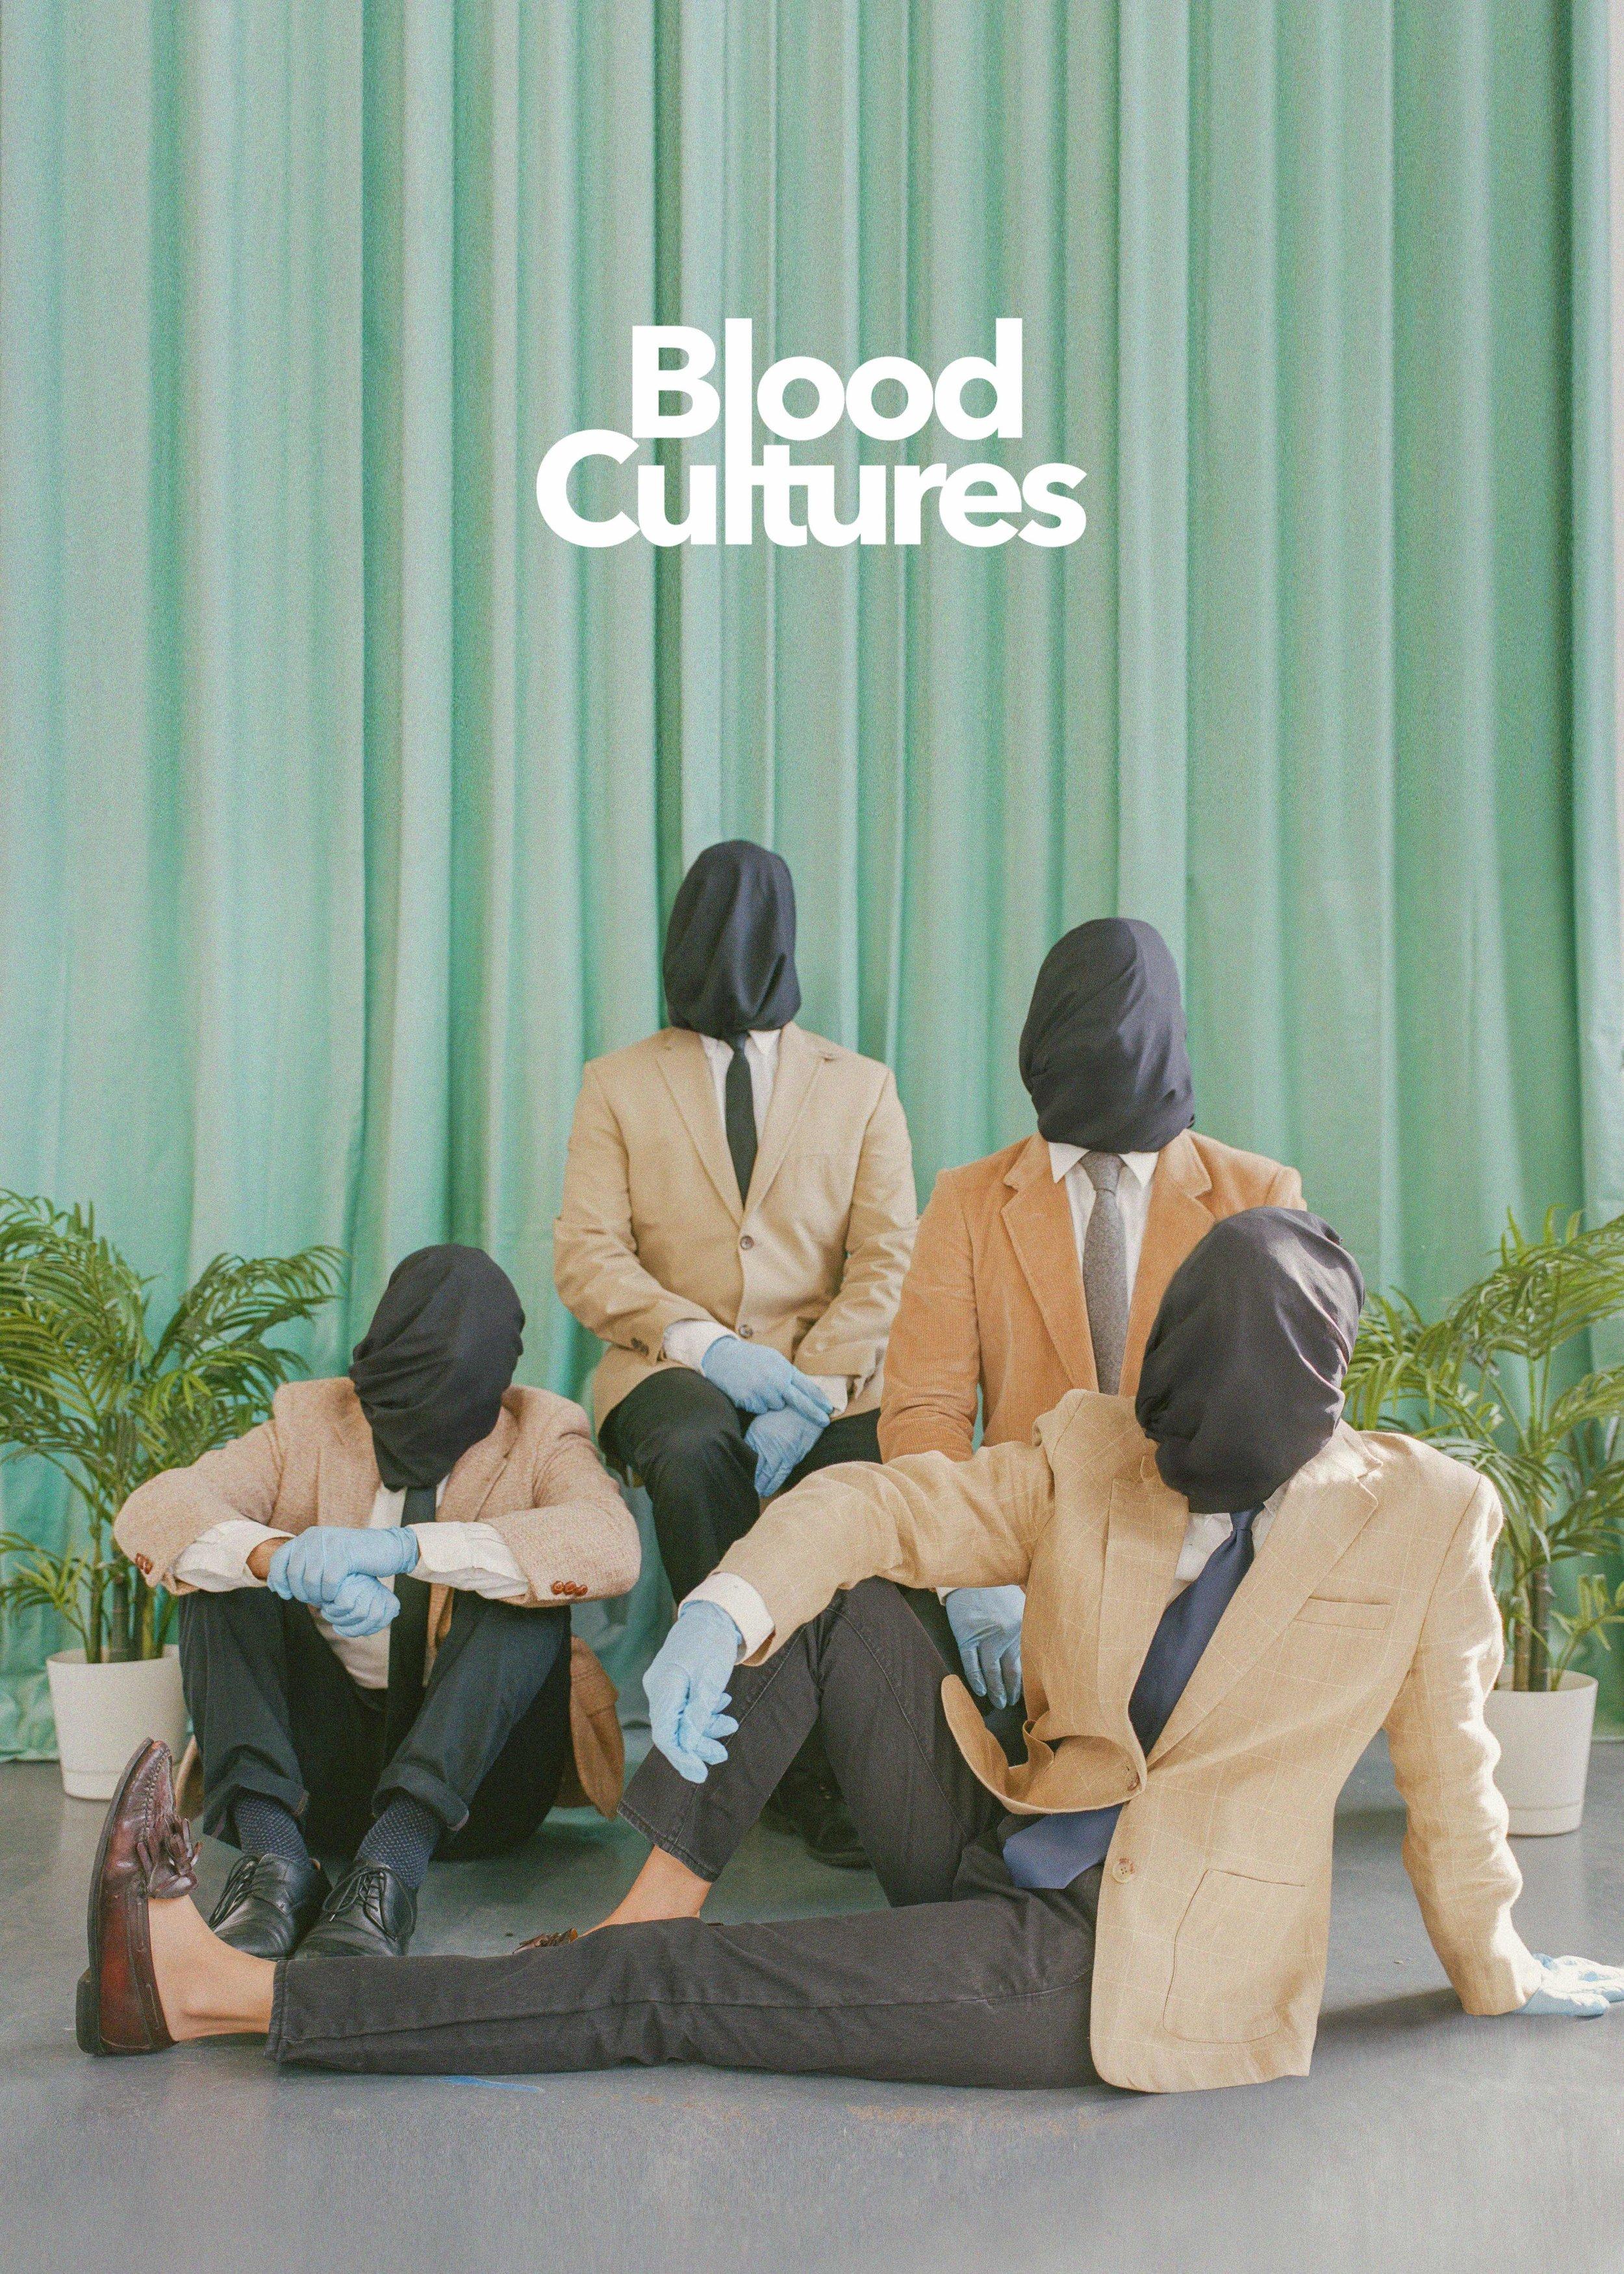 Blood Cultures - 2019 Press Photo 1.jpg